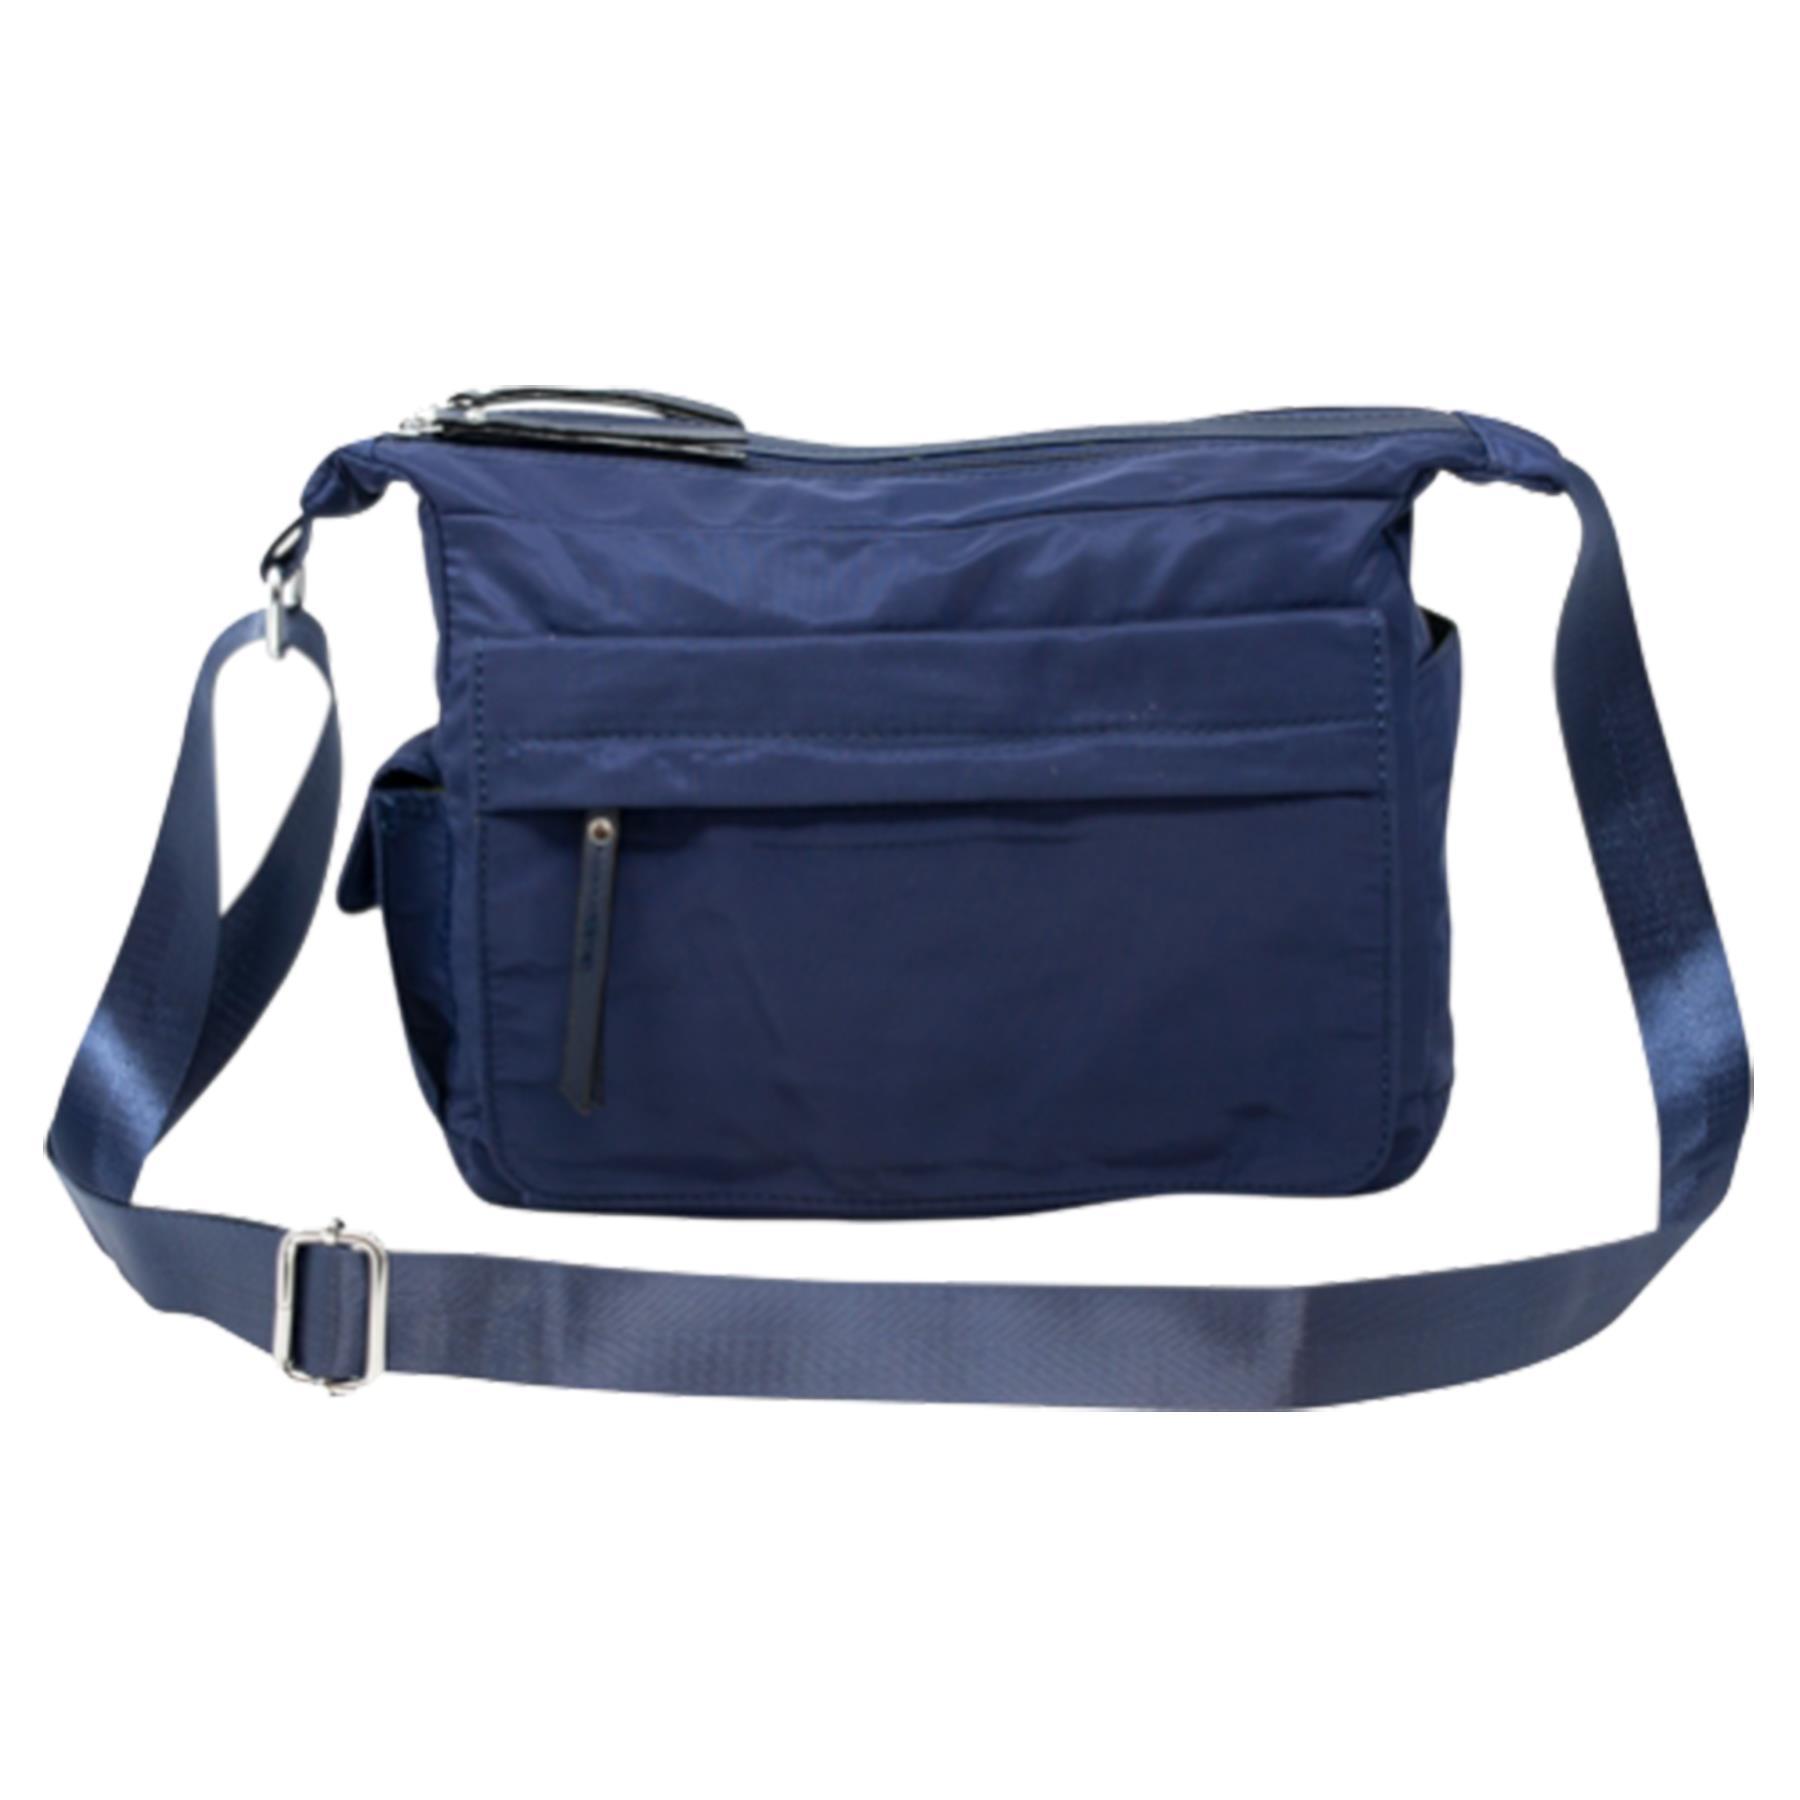 New-Ladies-Men-s-Showerproof-School-College-Practical-Basic-Crossbody-Bag thumbnail 12